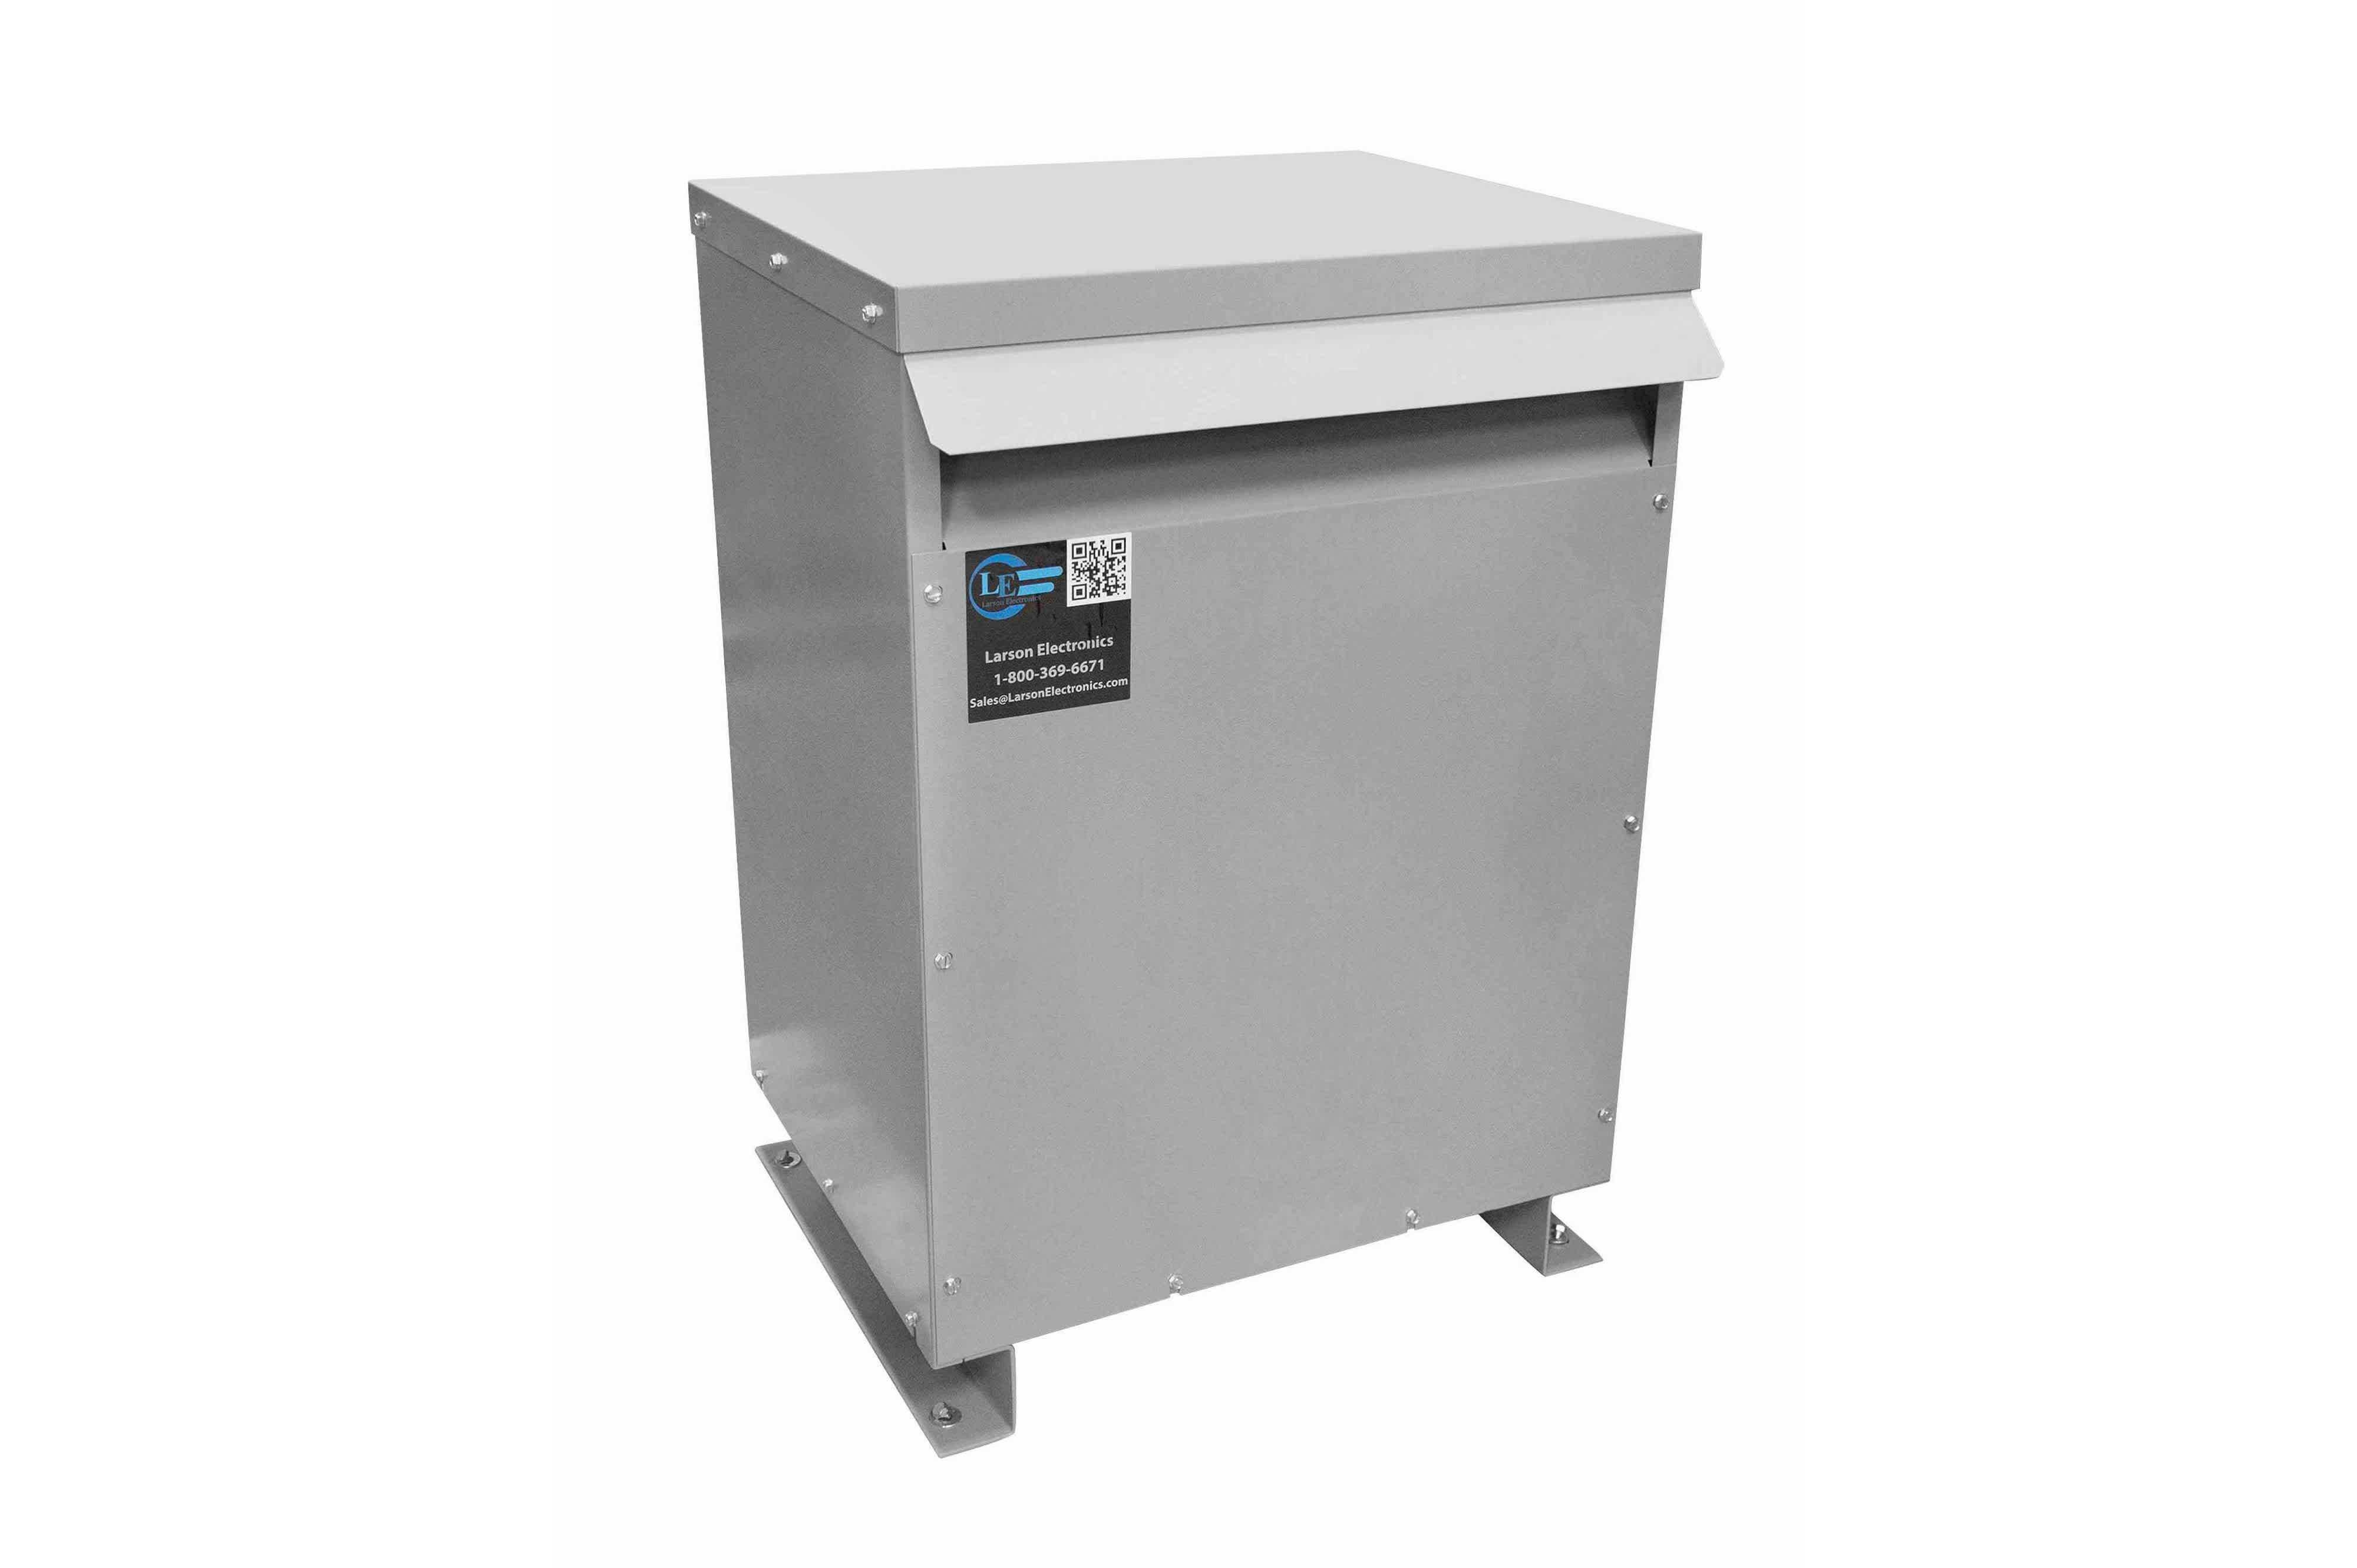 36 kVA 3PH Isolation Transformer, 600V Wye Primary, 380Y/220 Wye-N Secondary, N3R, Ventilated, 60 Hz